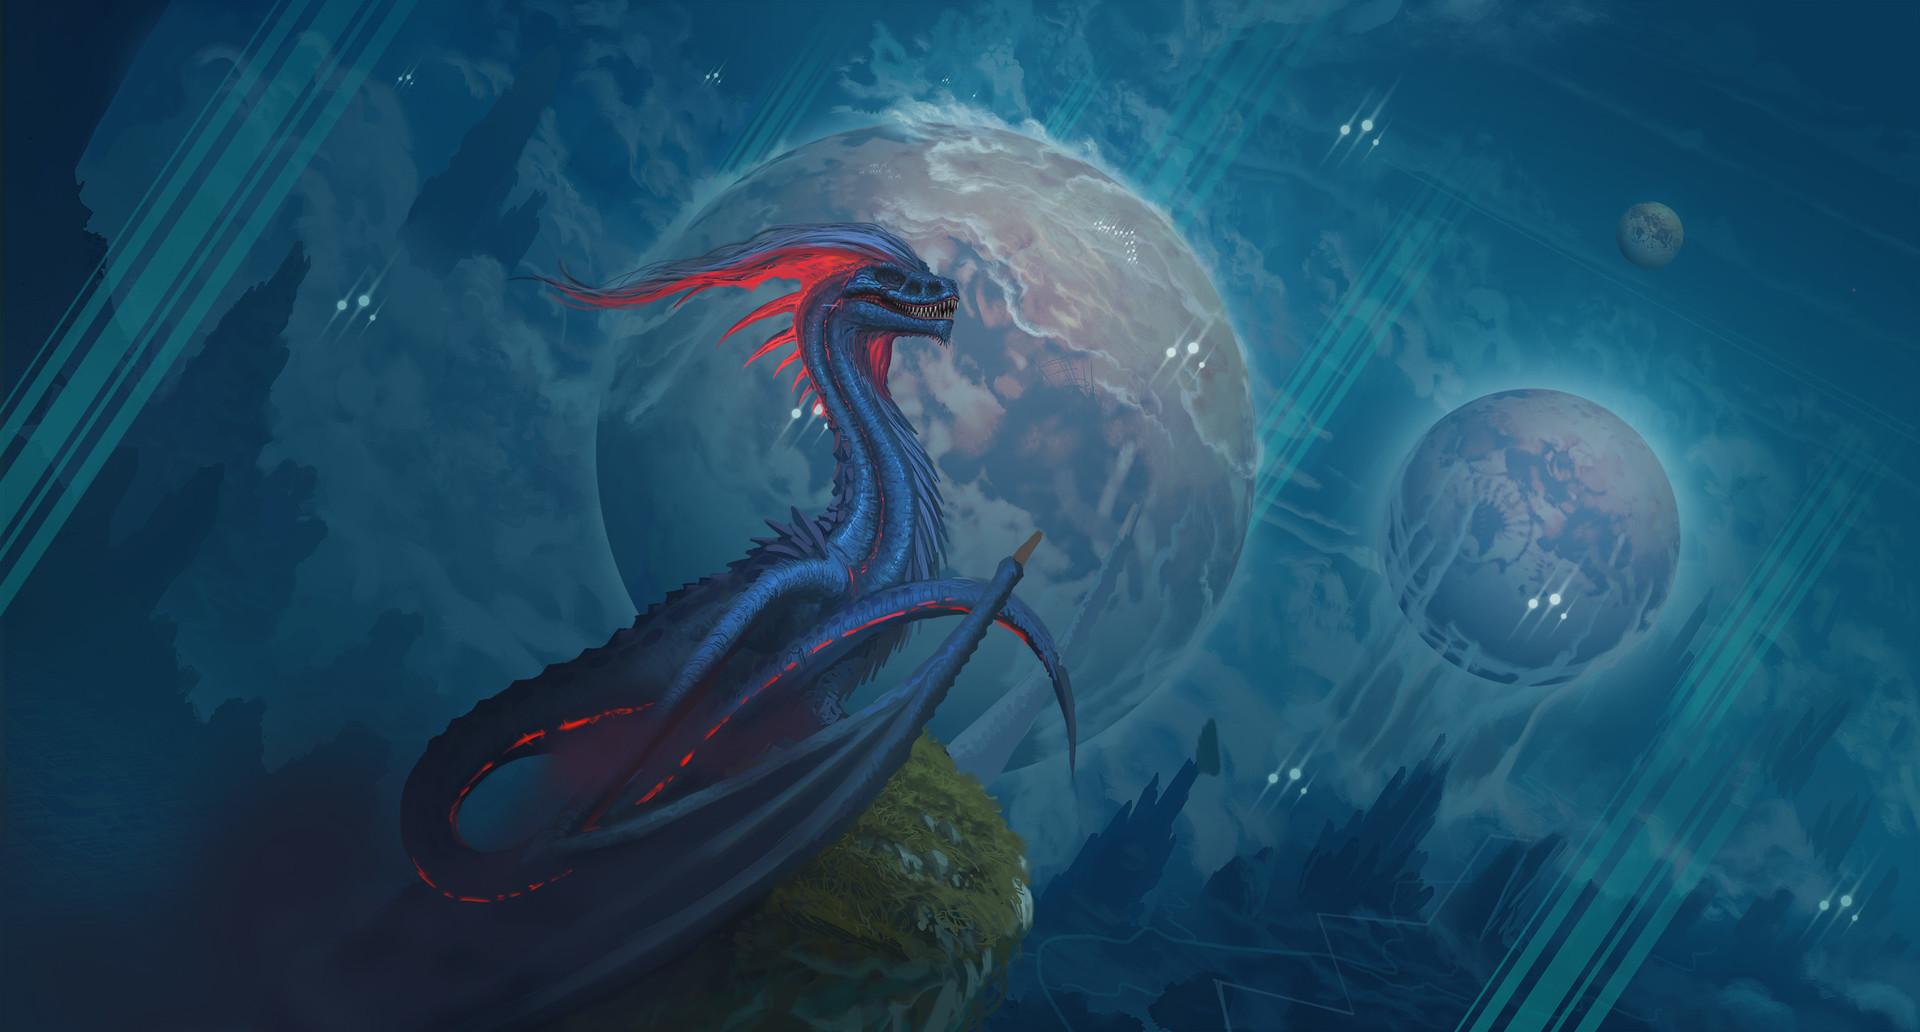 Francisco badilla floyd dragon sketch bueno 7